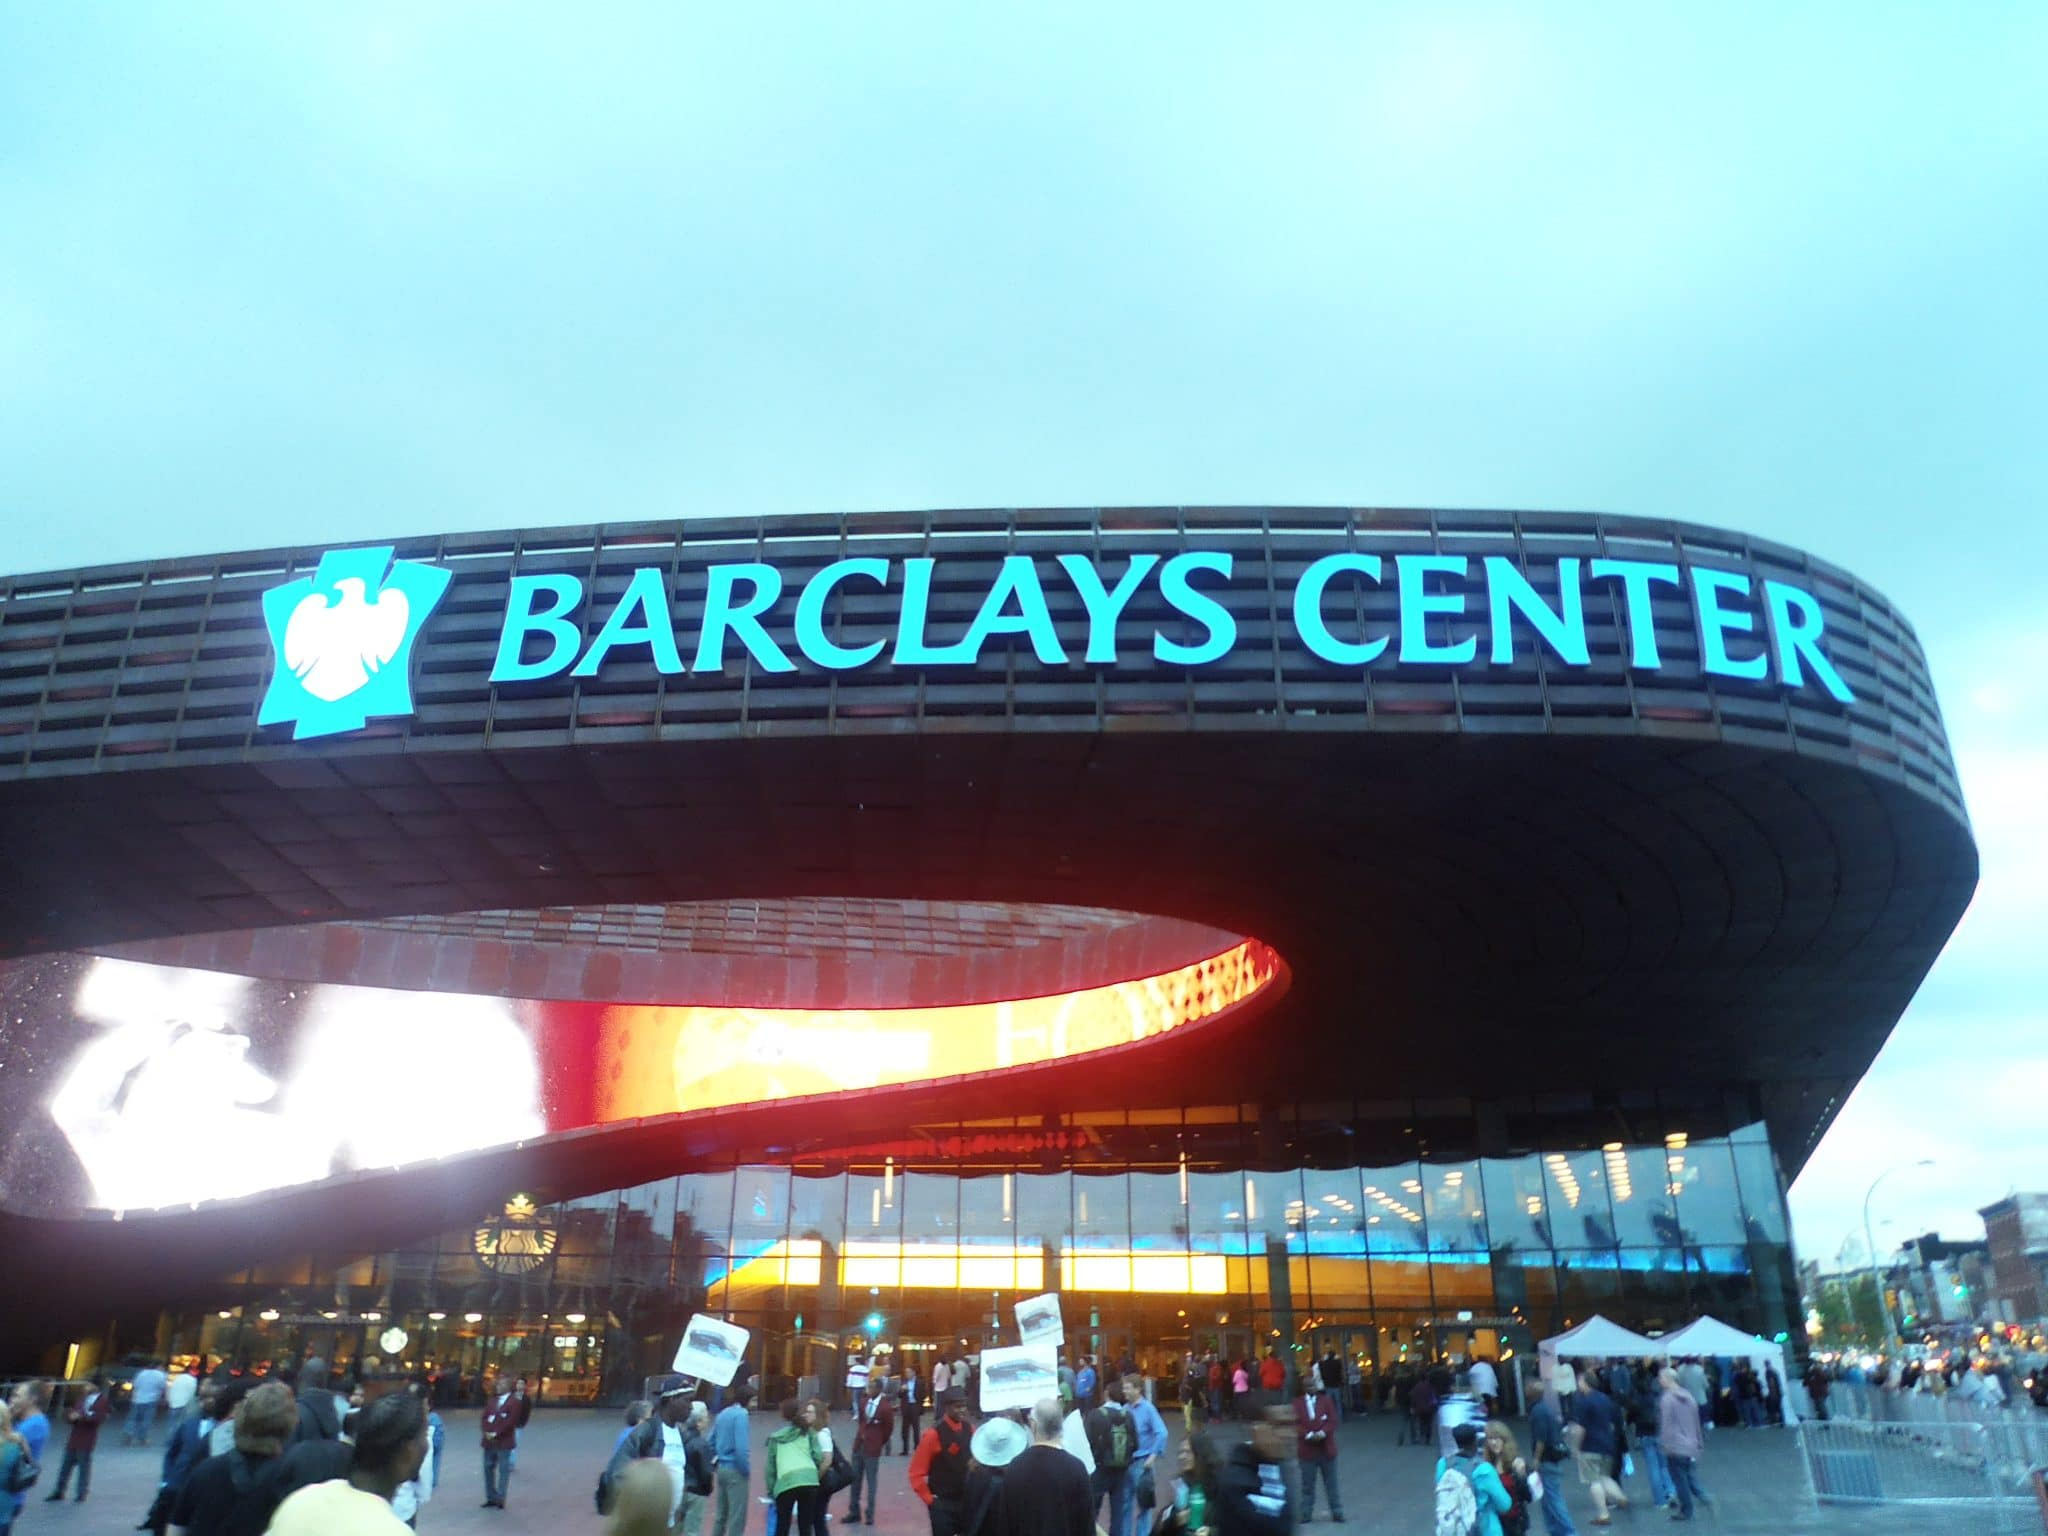 Barclays Center (source: Wikipedia)